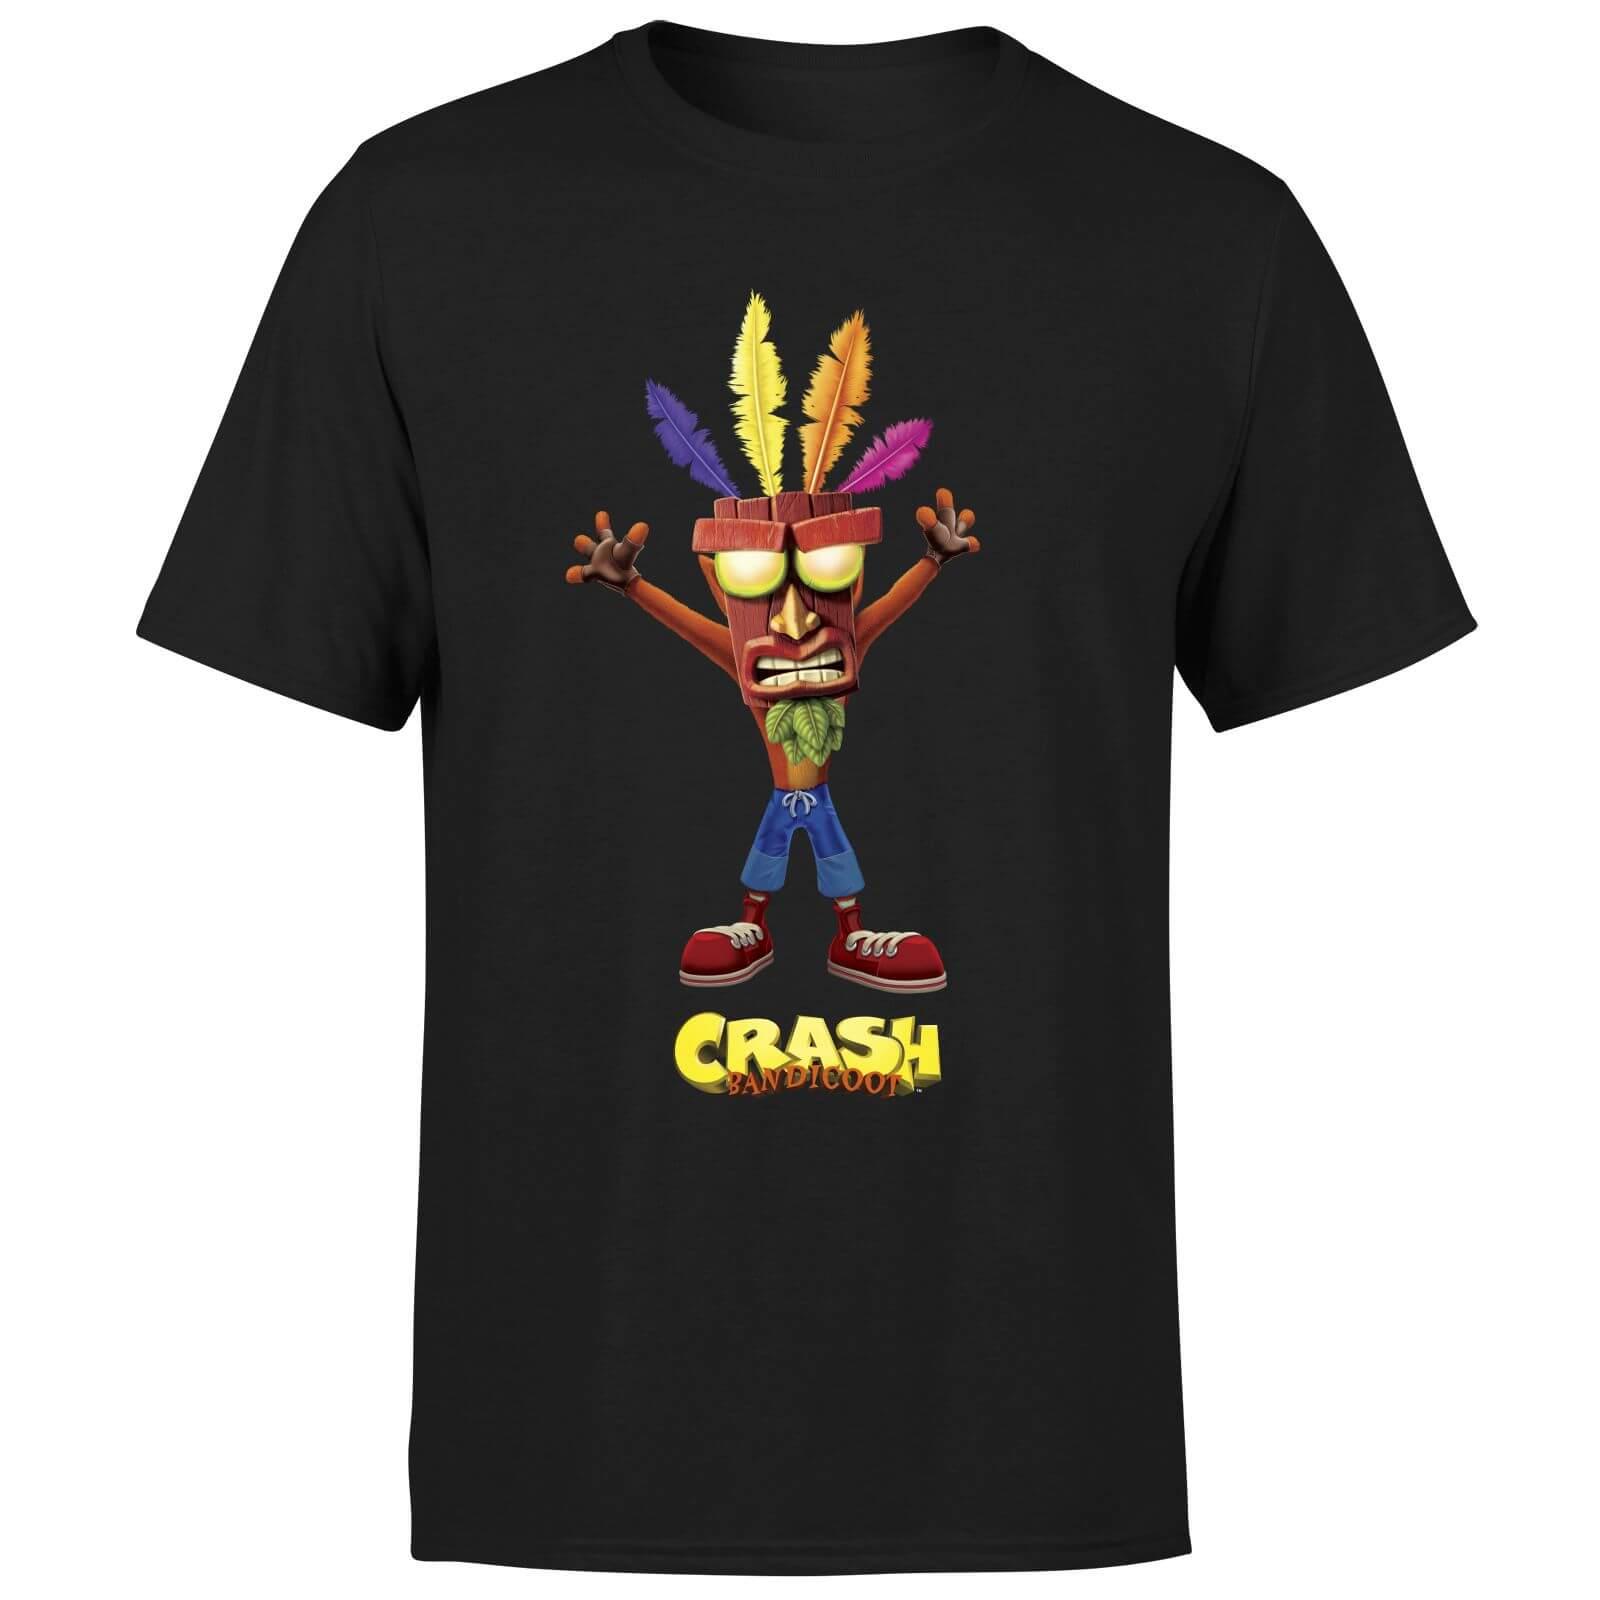 Crash Bandicoot - Aku Aku Herren T-Shirt für 10,99€ (MyGeekbox)